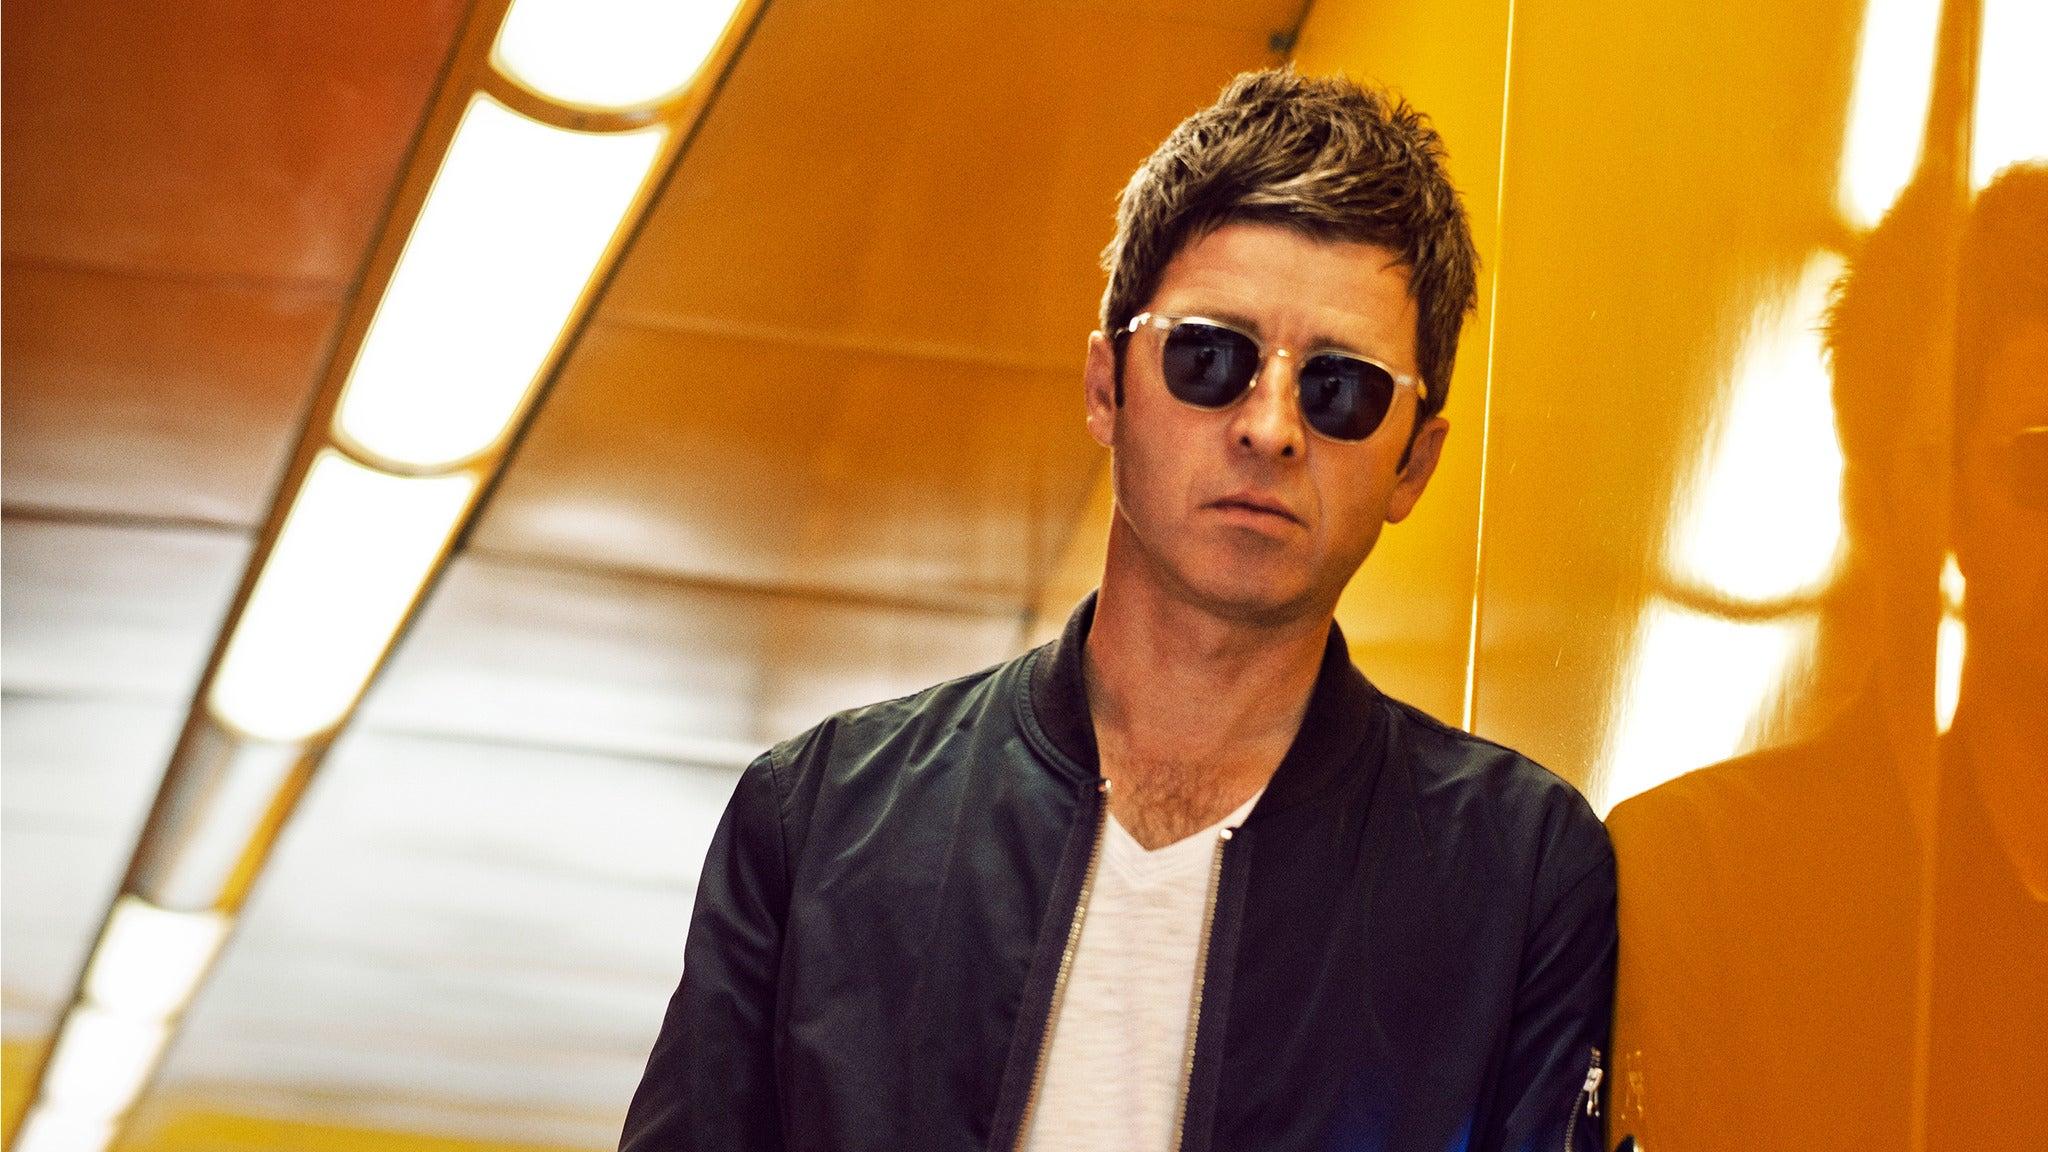 Noel Gallagher's High Flying Birds at Ryman Auditorium